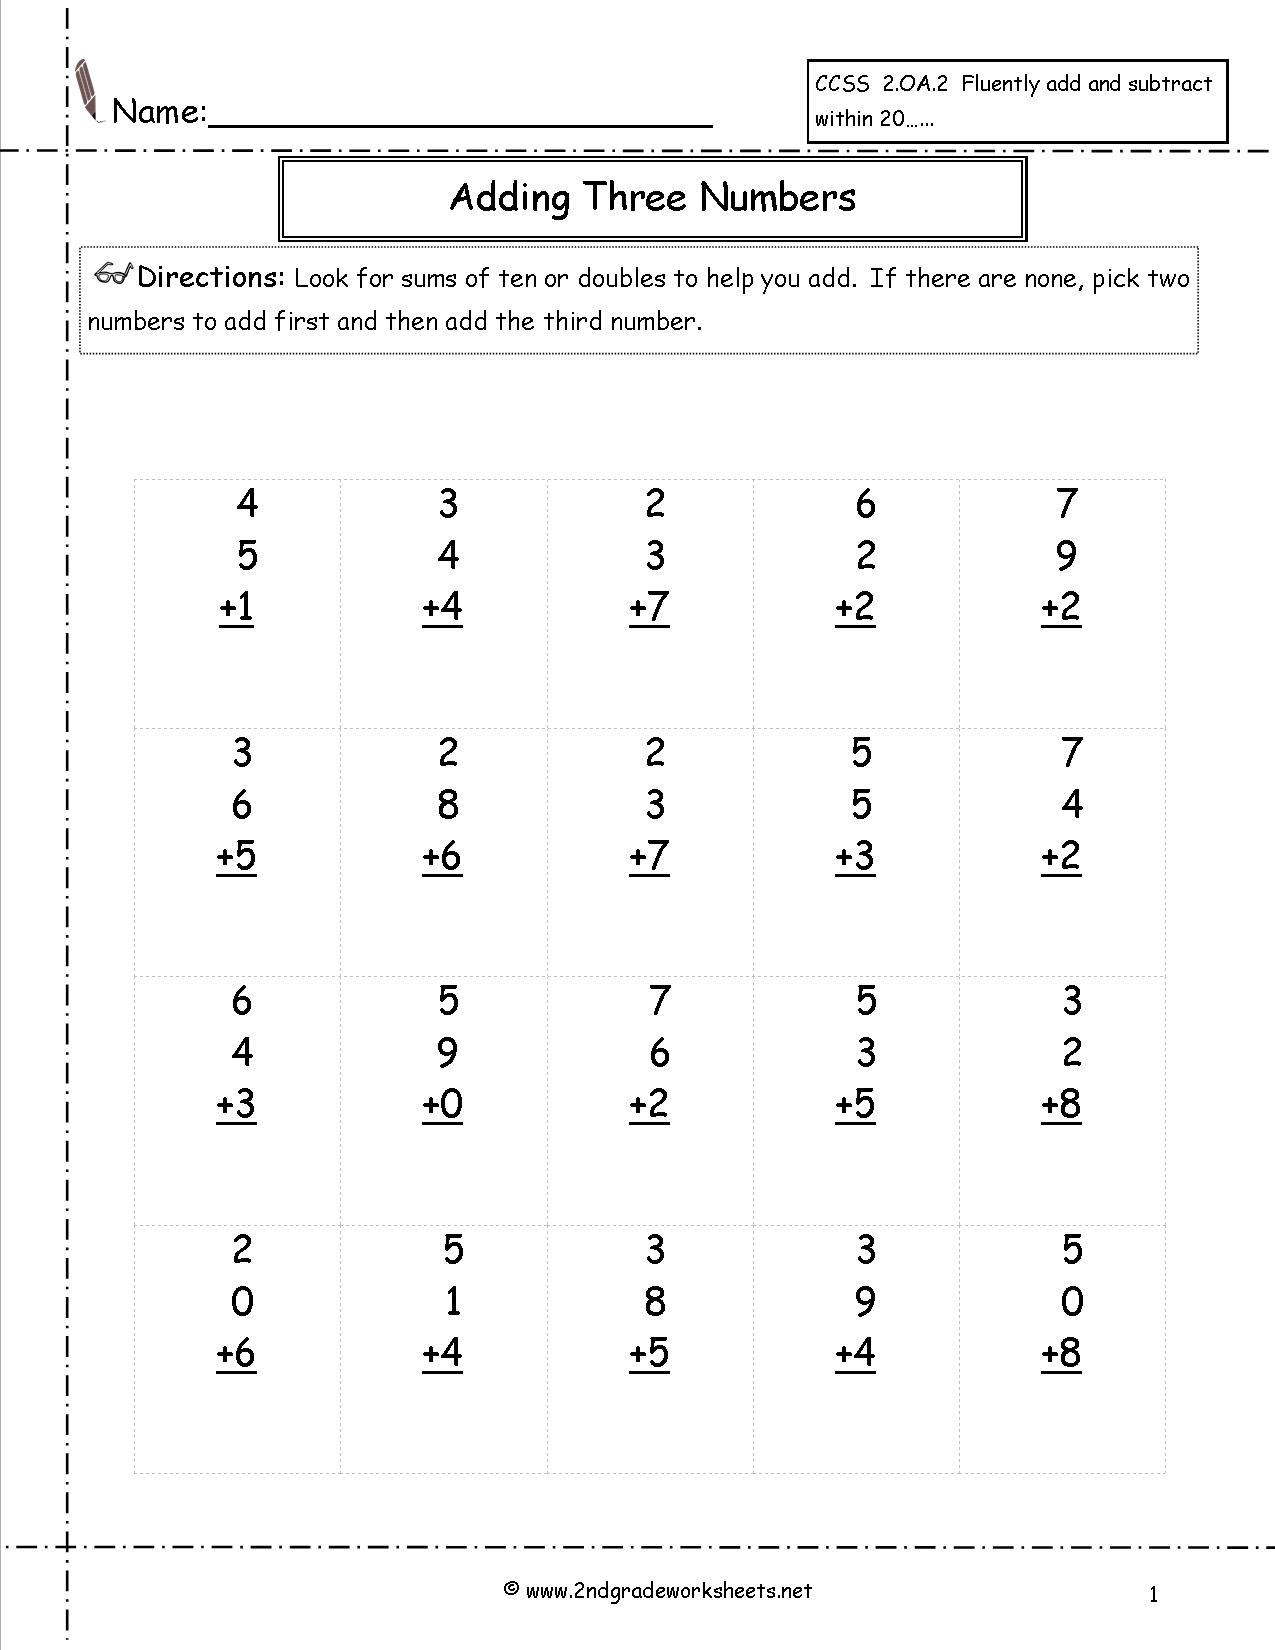 Free Math Worksheets And Printouts | Printable Math Worksheets For Grade 2